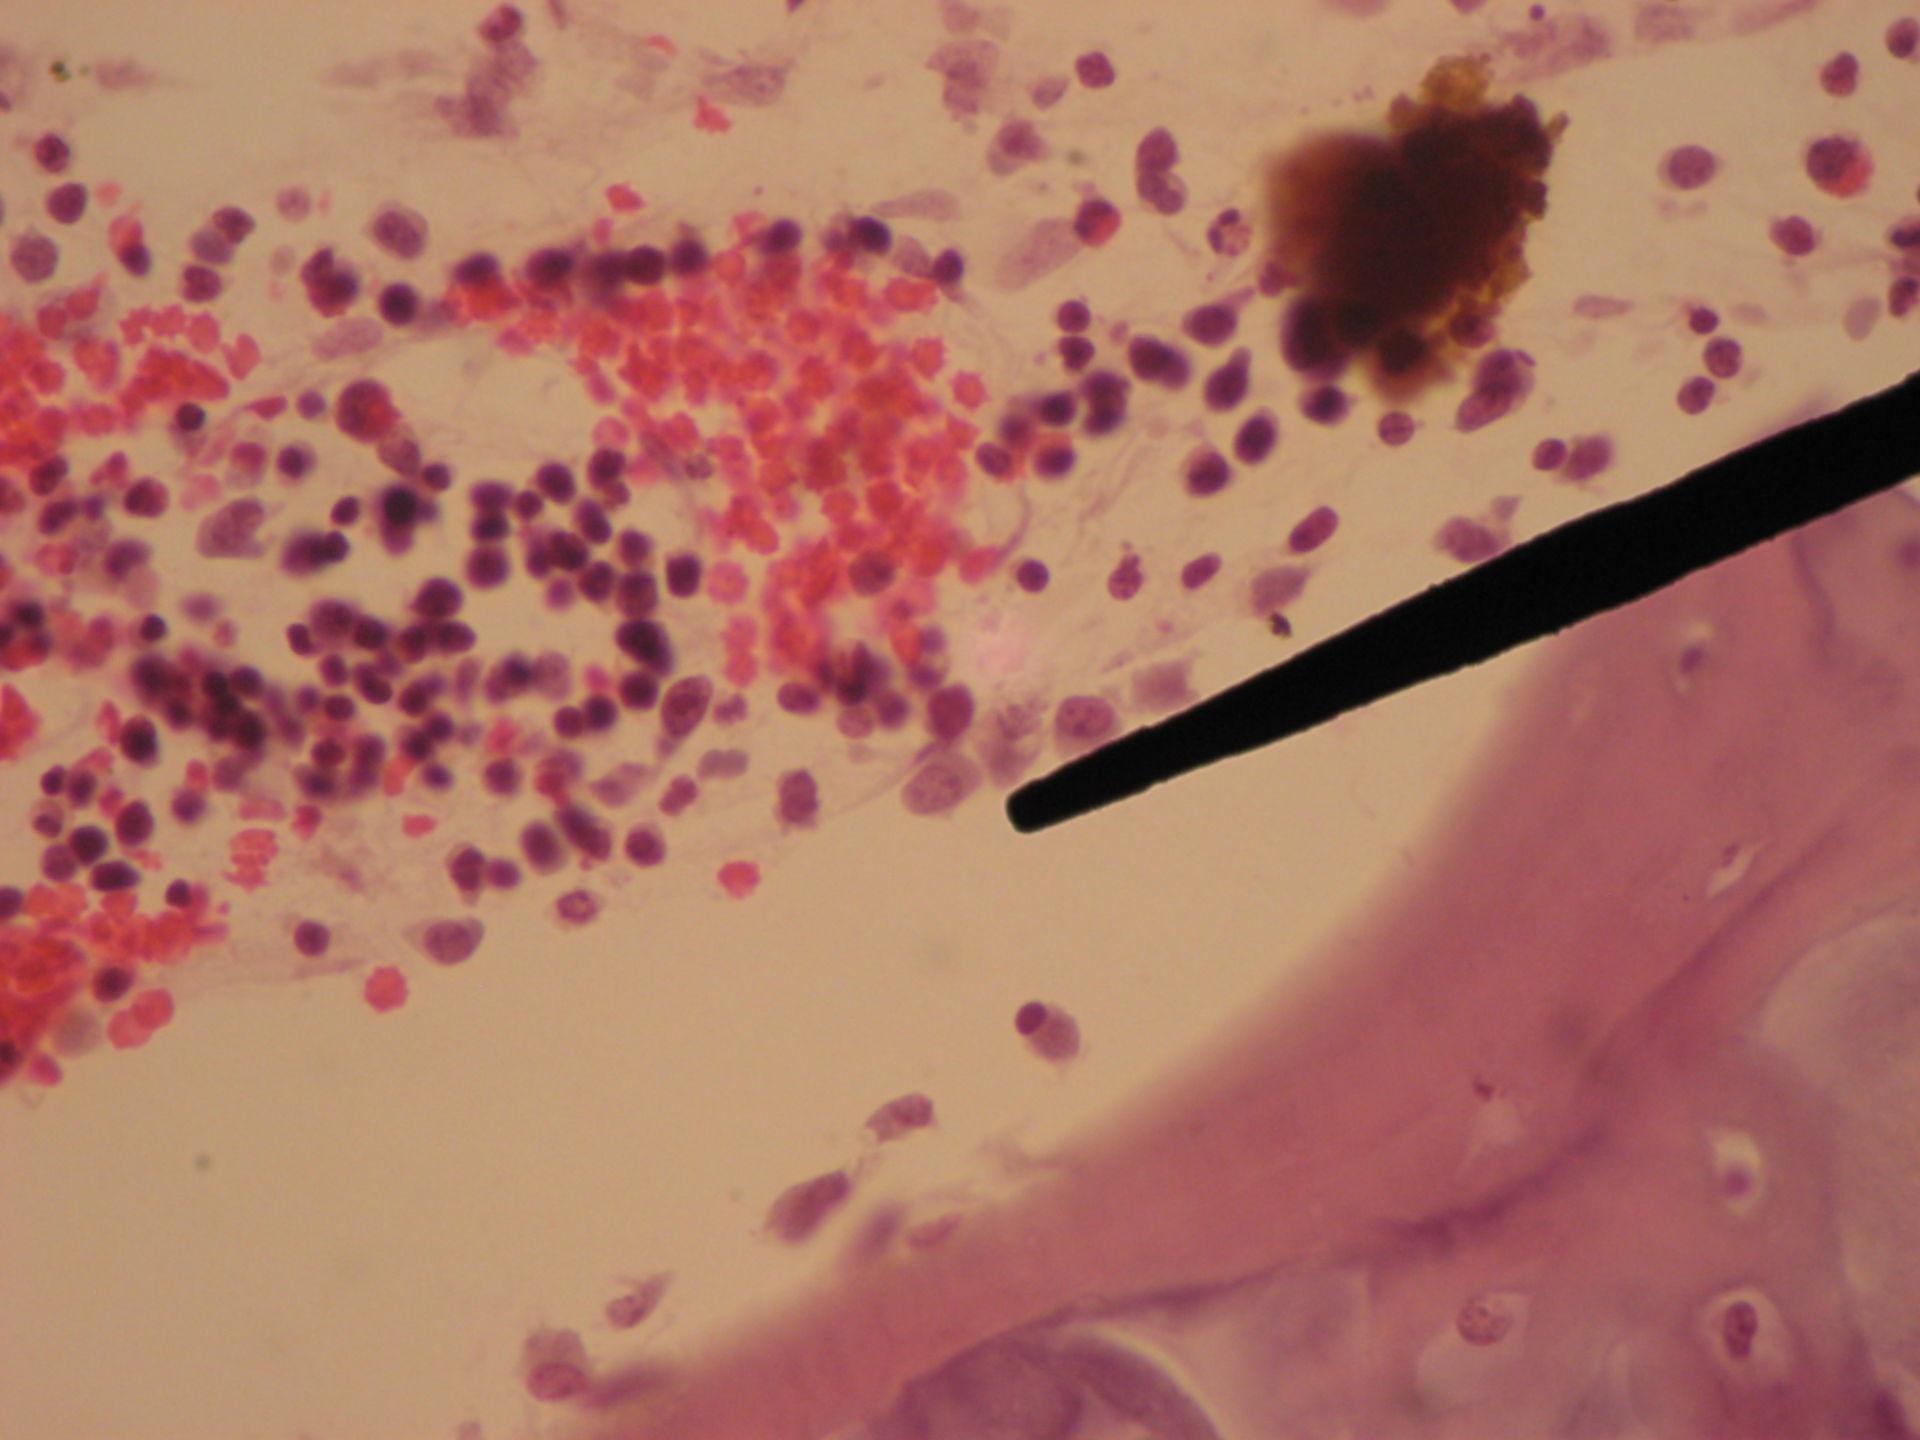 Red bone marrow of a pig fetus (4) - macrophage